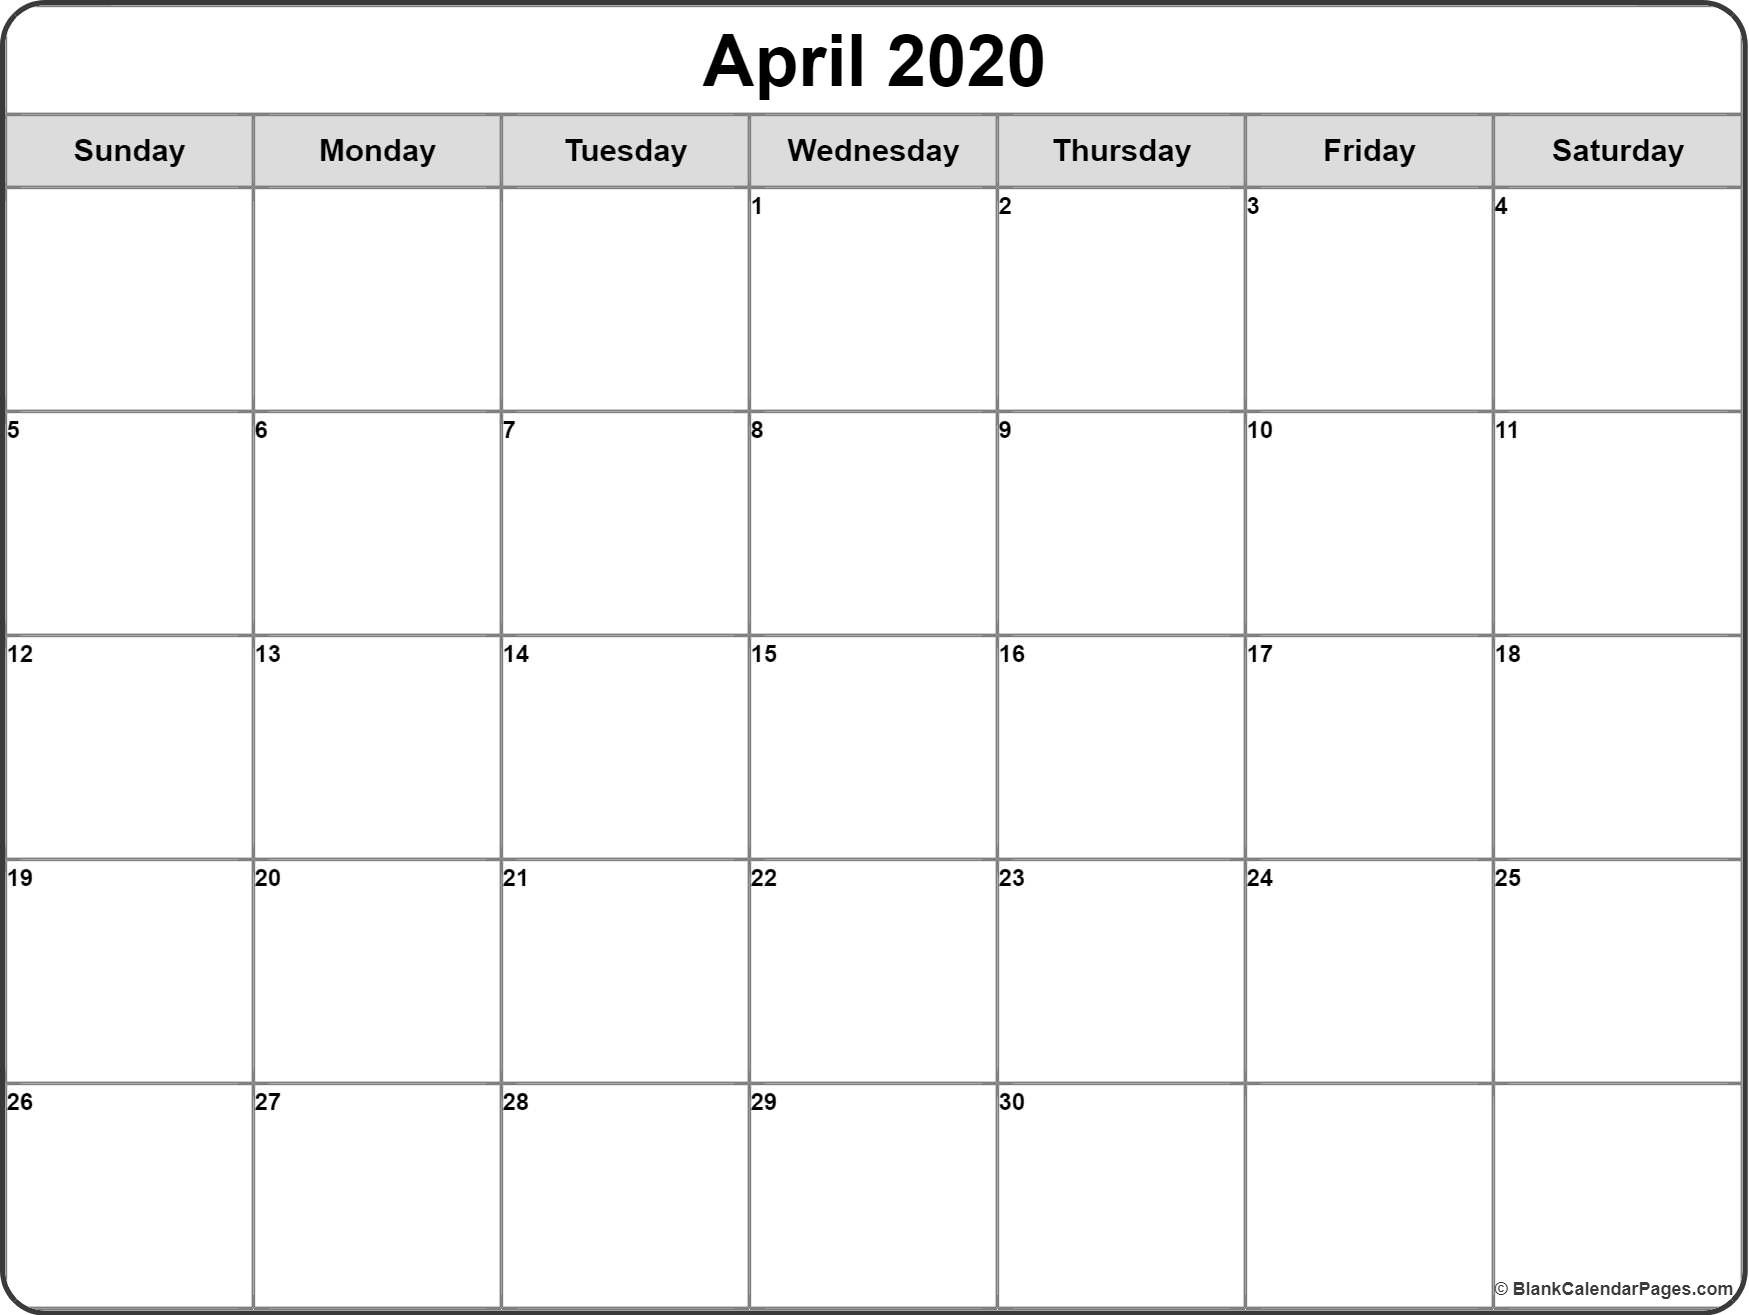 April 2020 Calendar | Free Printable Monthly Calendars-Fill In Calendar April 2020 Template